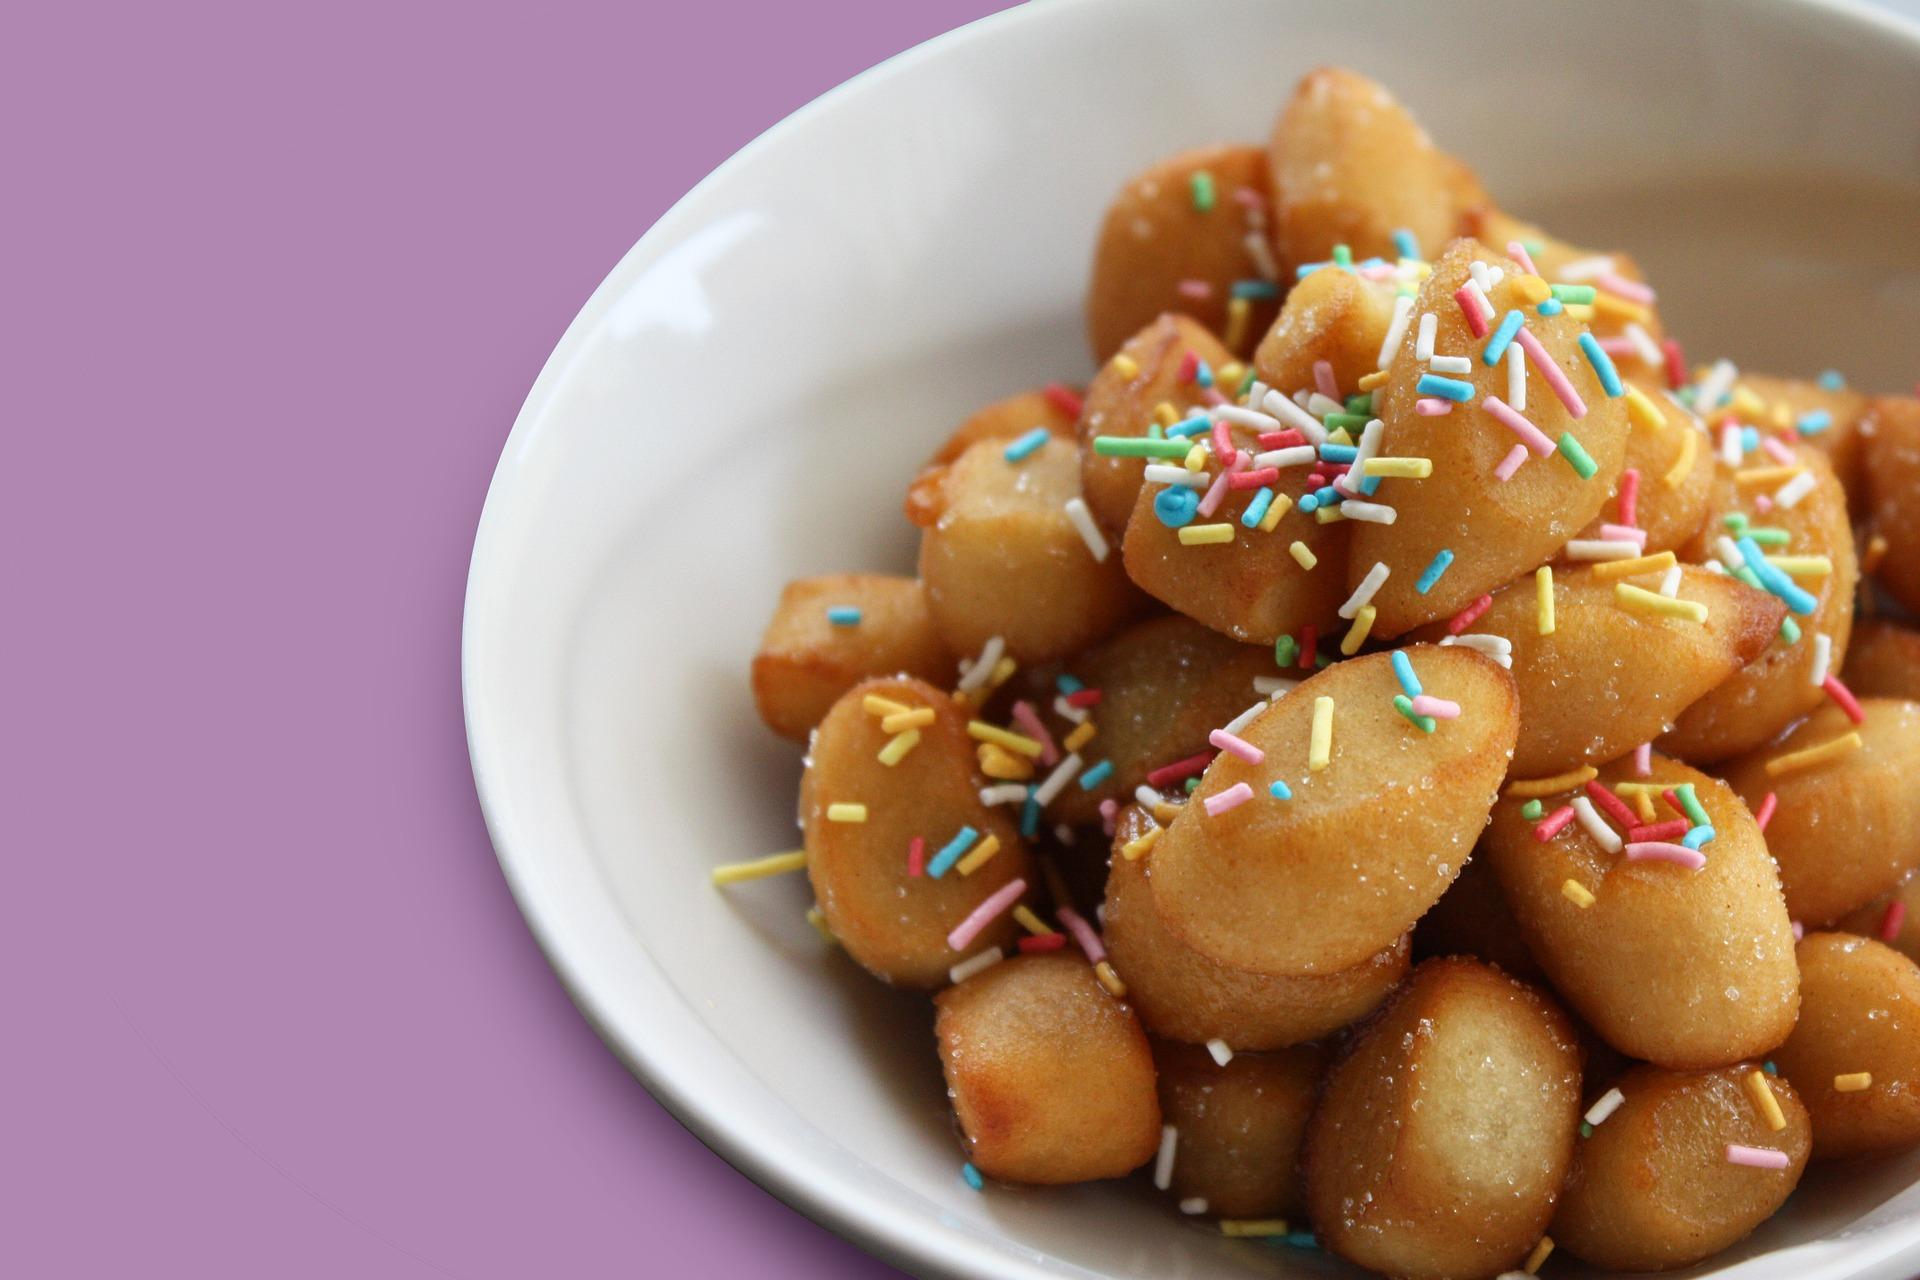 dolci tipici della Befana, Typische Suessspeisen der Befana, typical Epiphany cakes, friandises typiques de epiphanie, dulces típicos